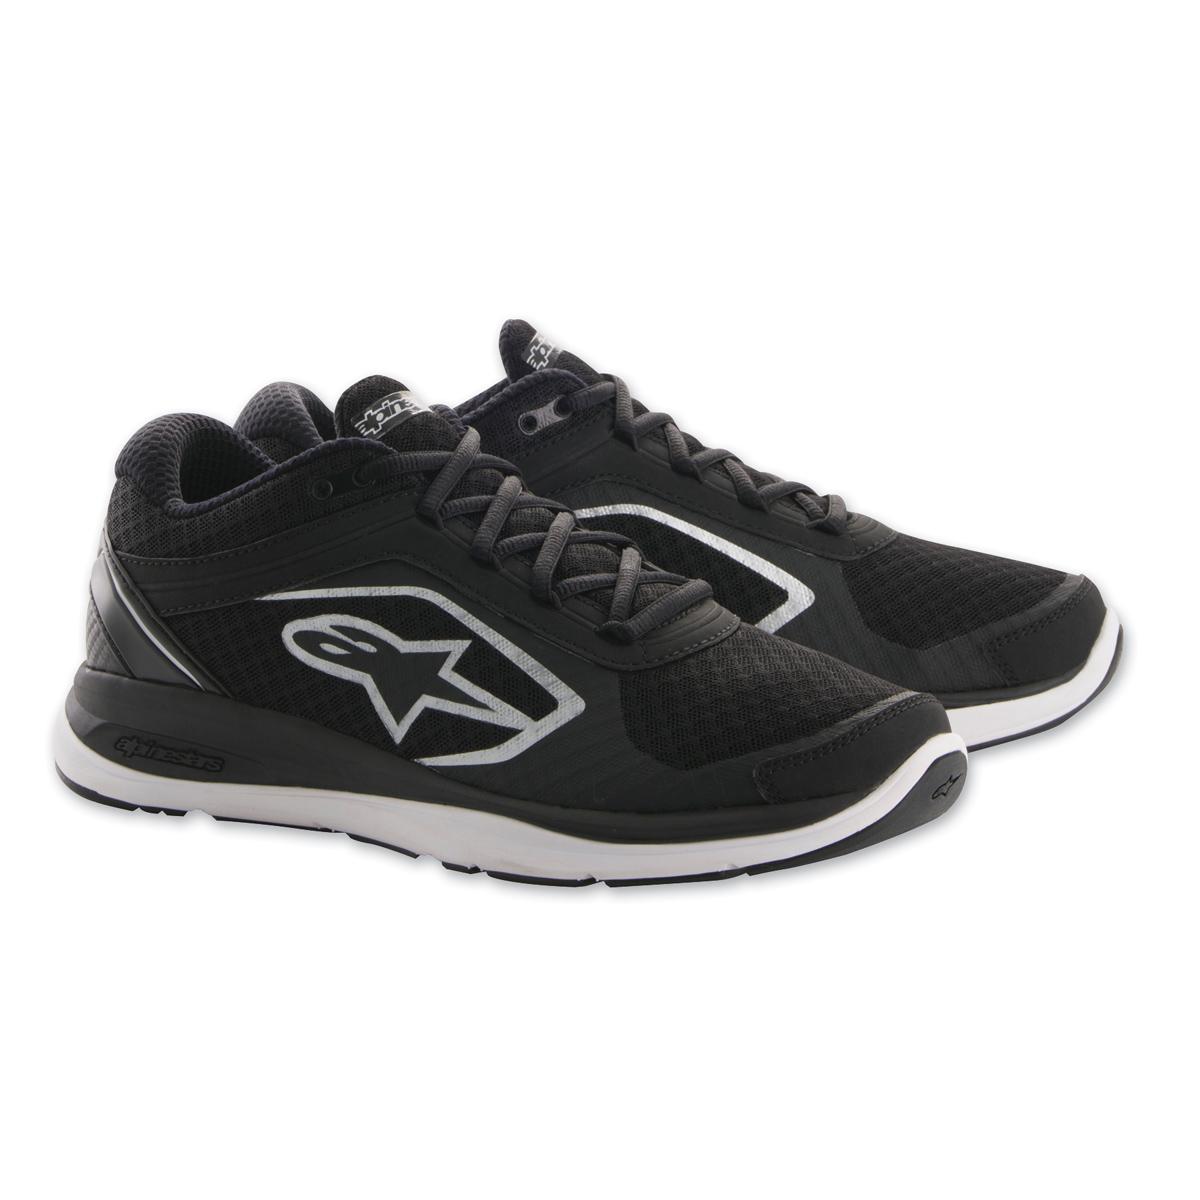 Alpinestars Men's Alloy Black Shoes